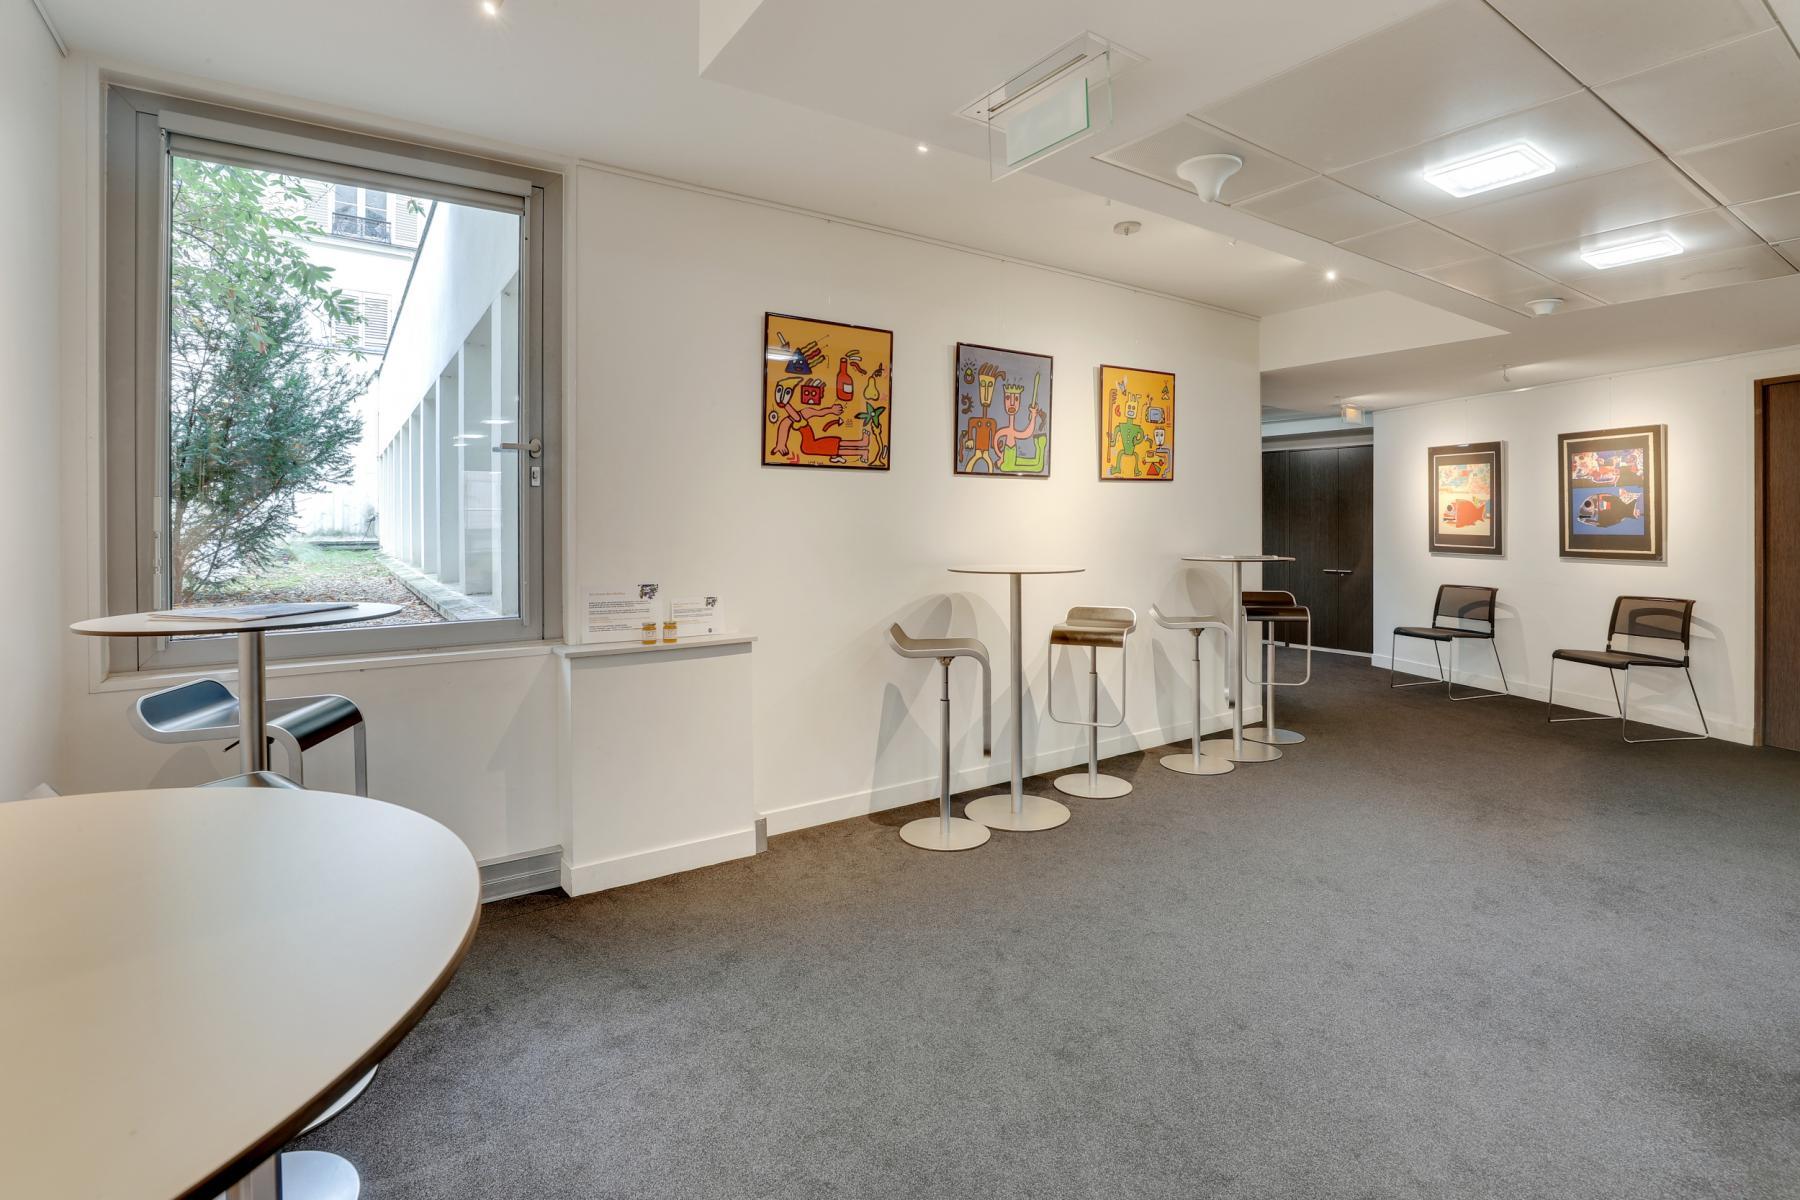 Location bureau Rue Quentin-Bauchart 20, Paris (13)